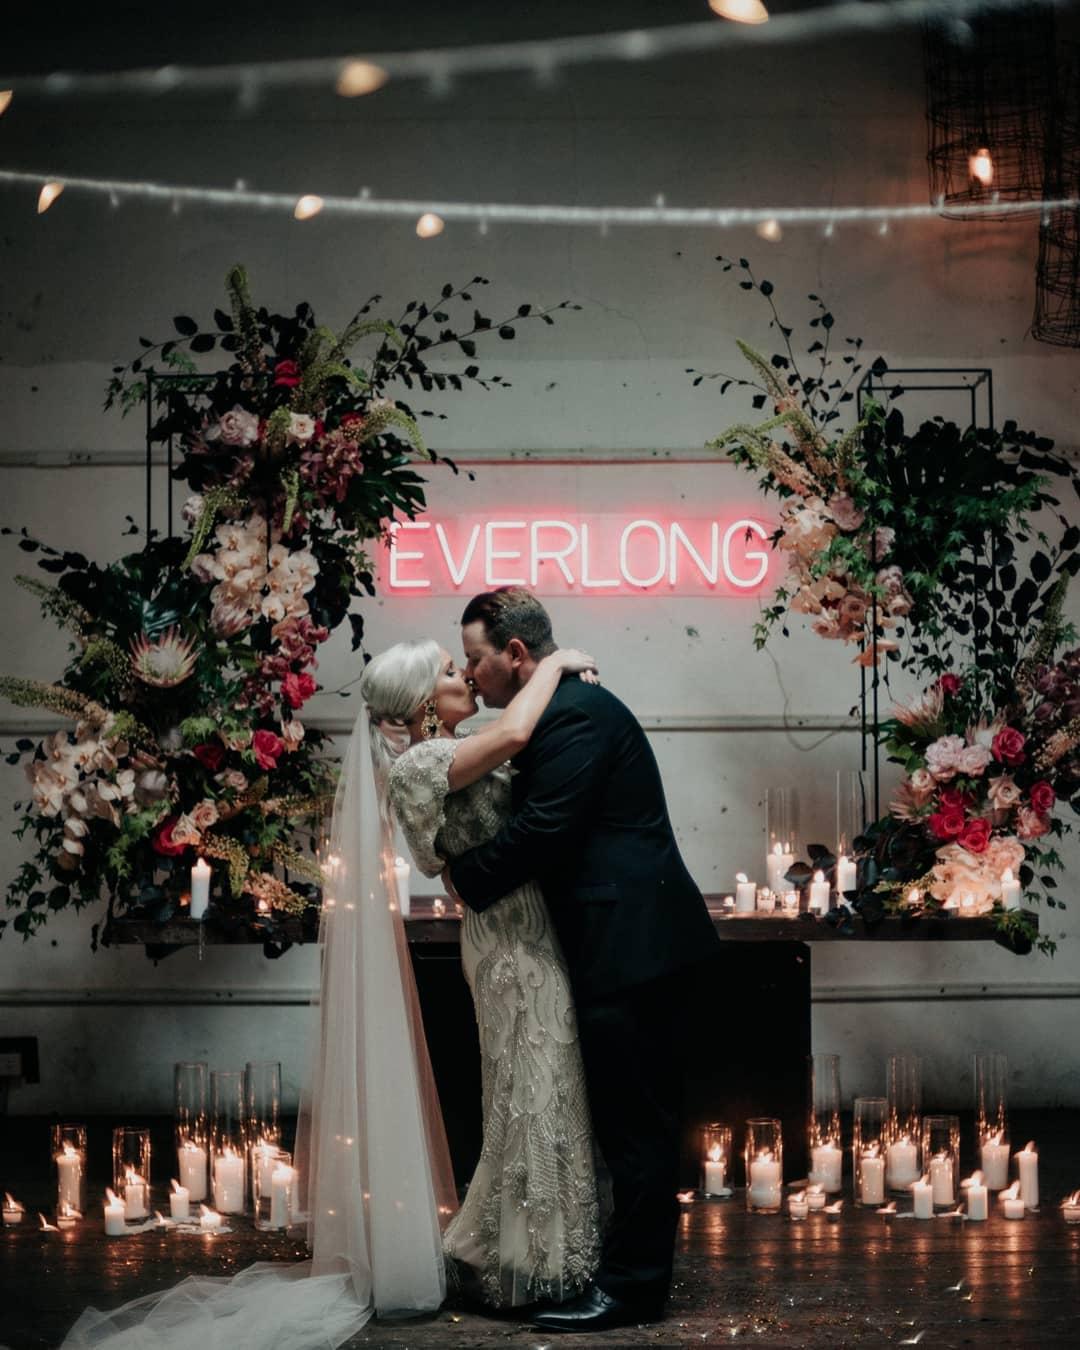 EVERLONG Wedding Led Light Hire Foo Figh